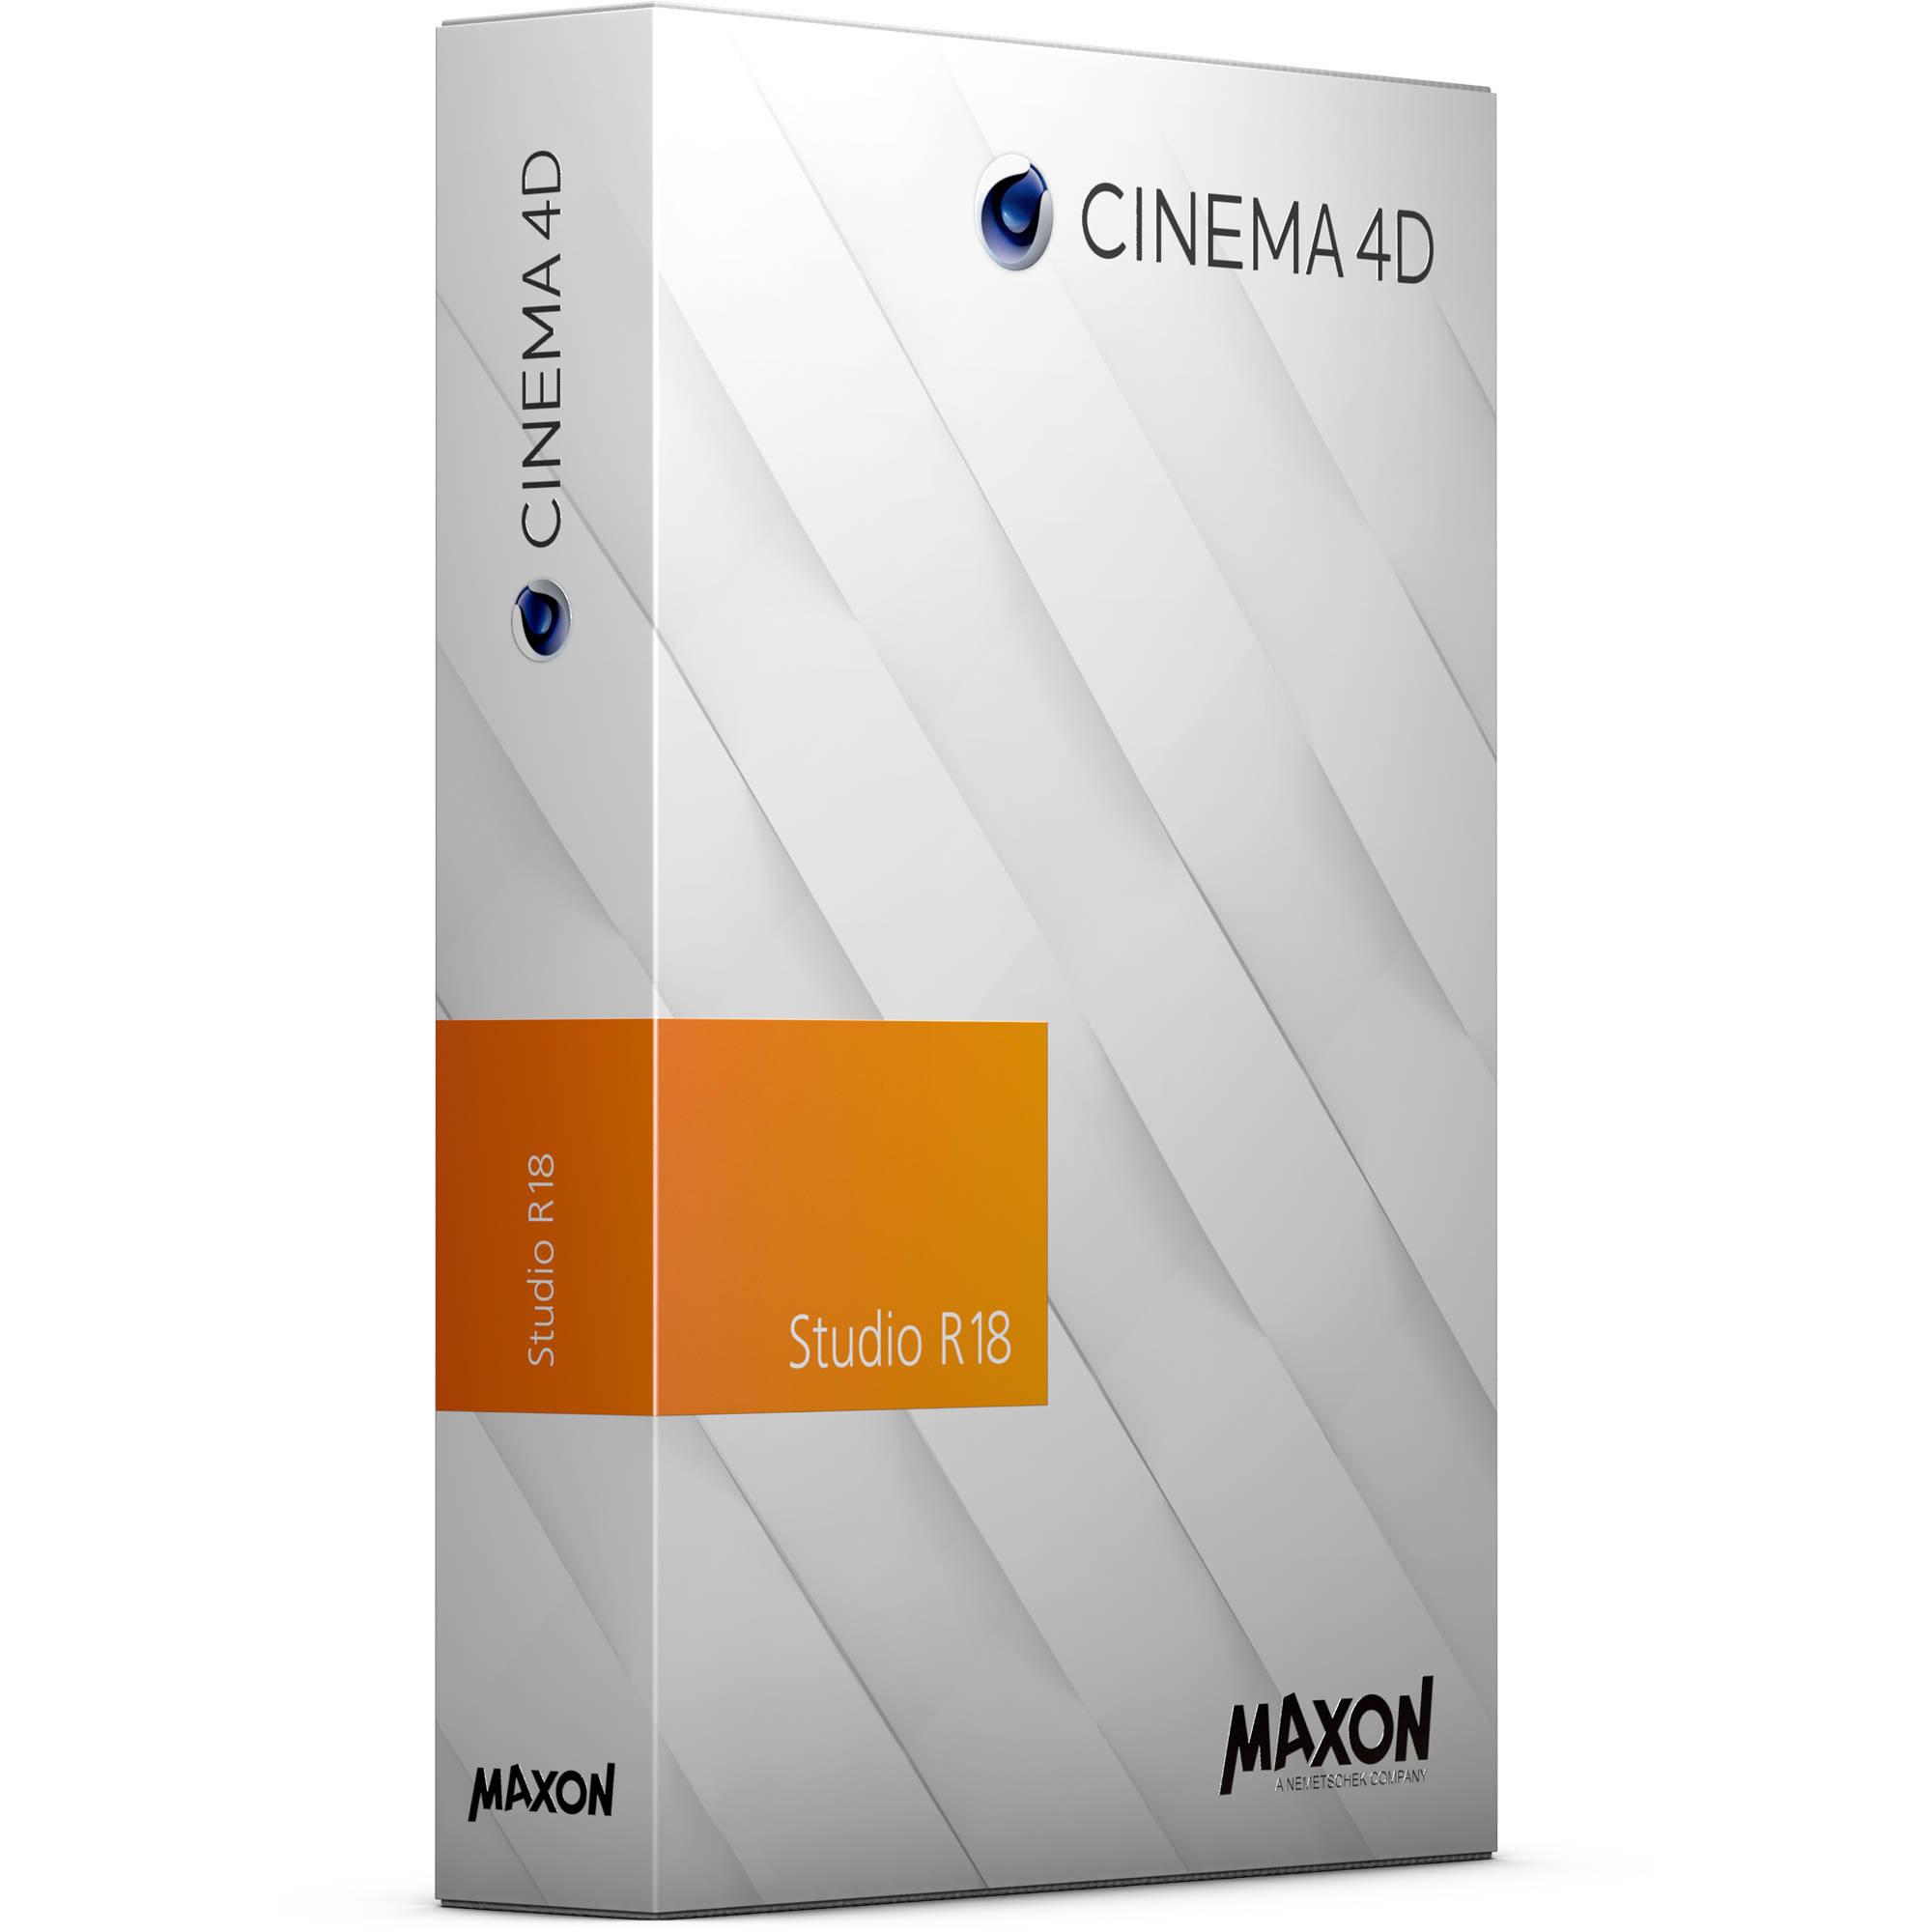 Cinema 4d full download.